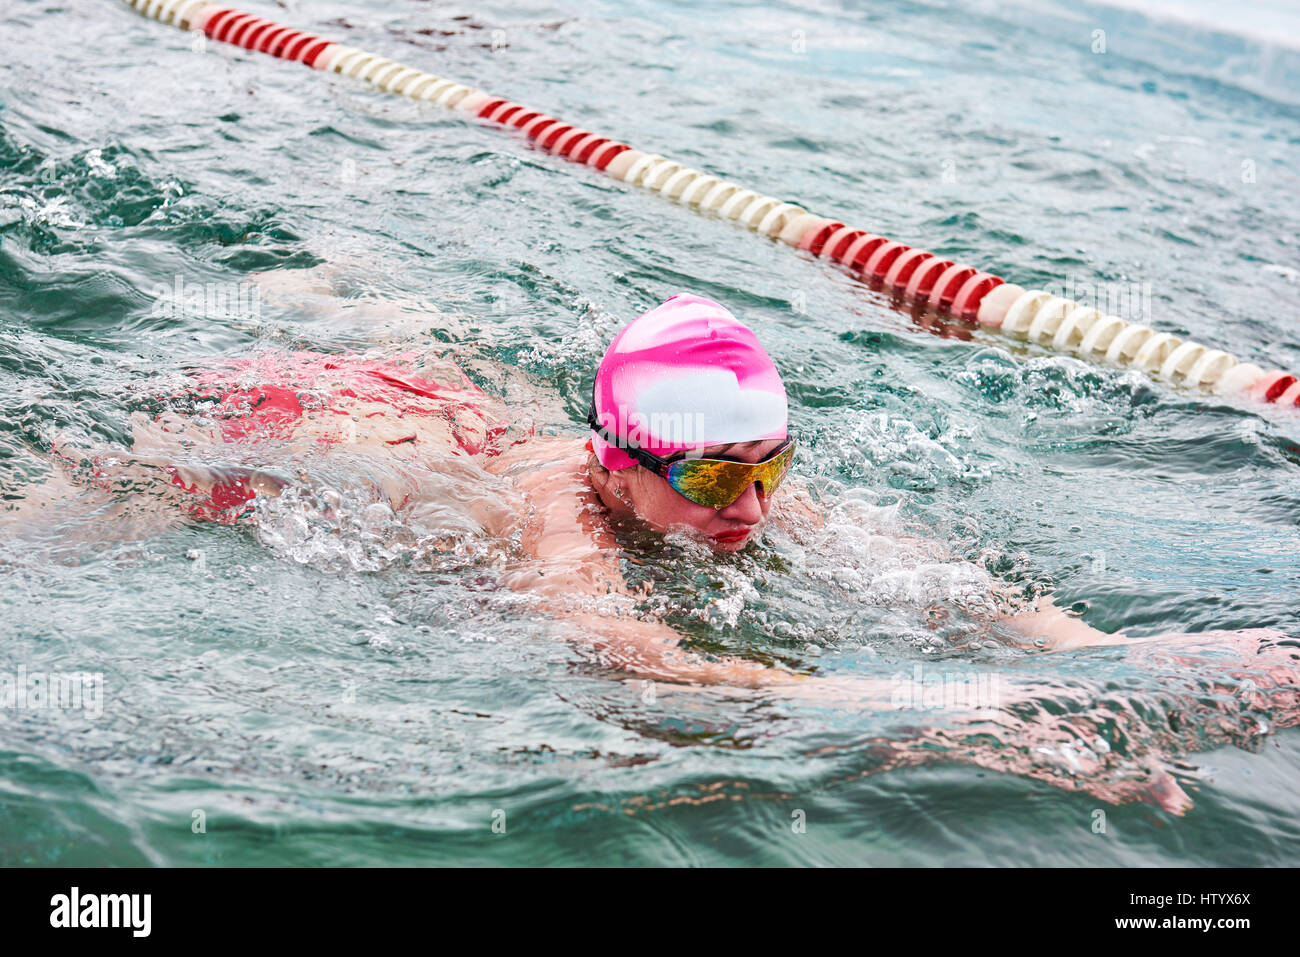 SAHYURTA, IRKUTSK REGION, RUSSIA - March 11.2017: Cup of Baikal. Winter Swimming Competitions. Breaststroke. Woman - Stock Image